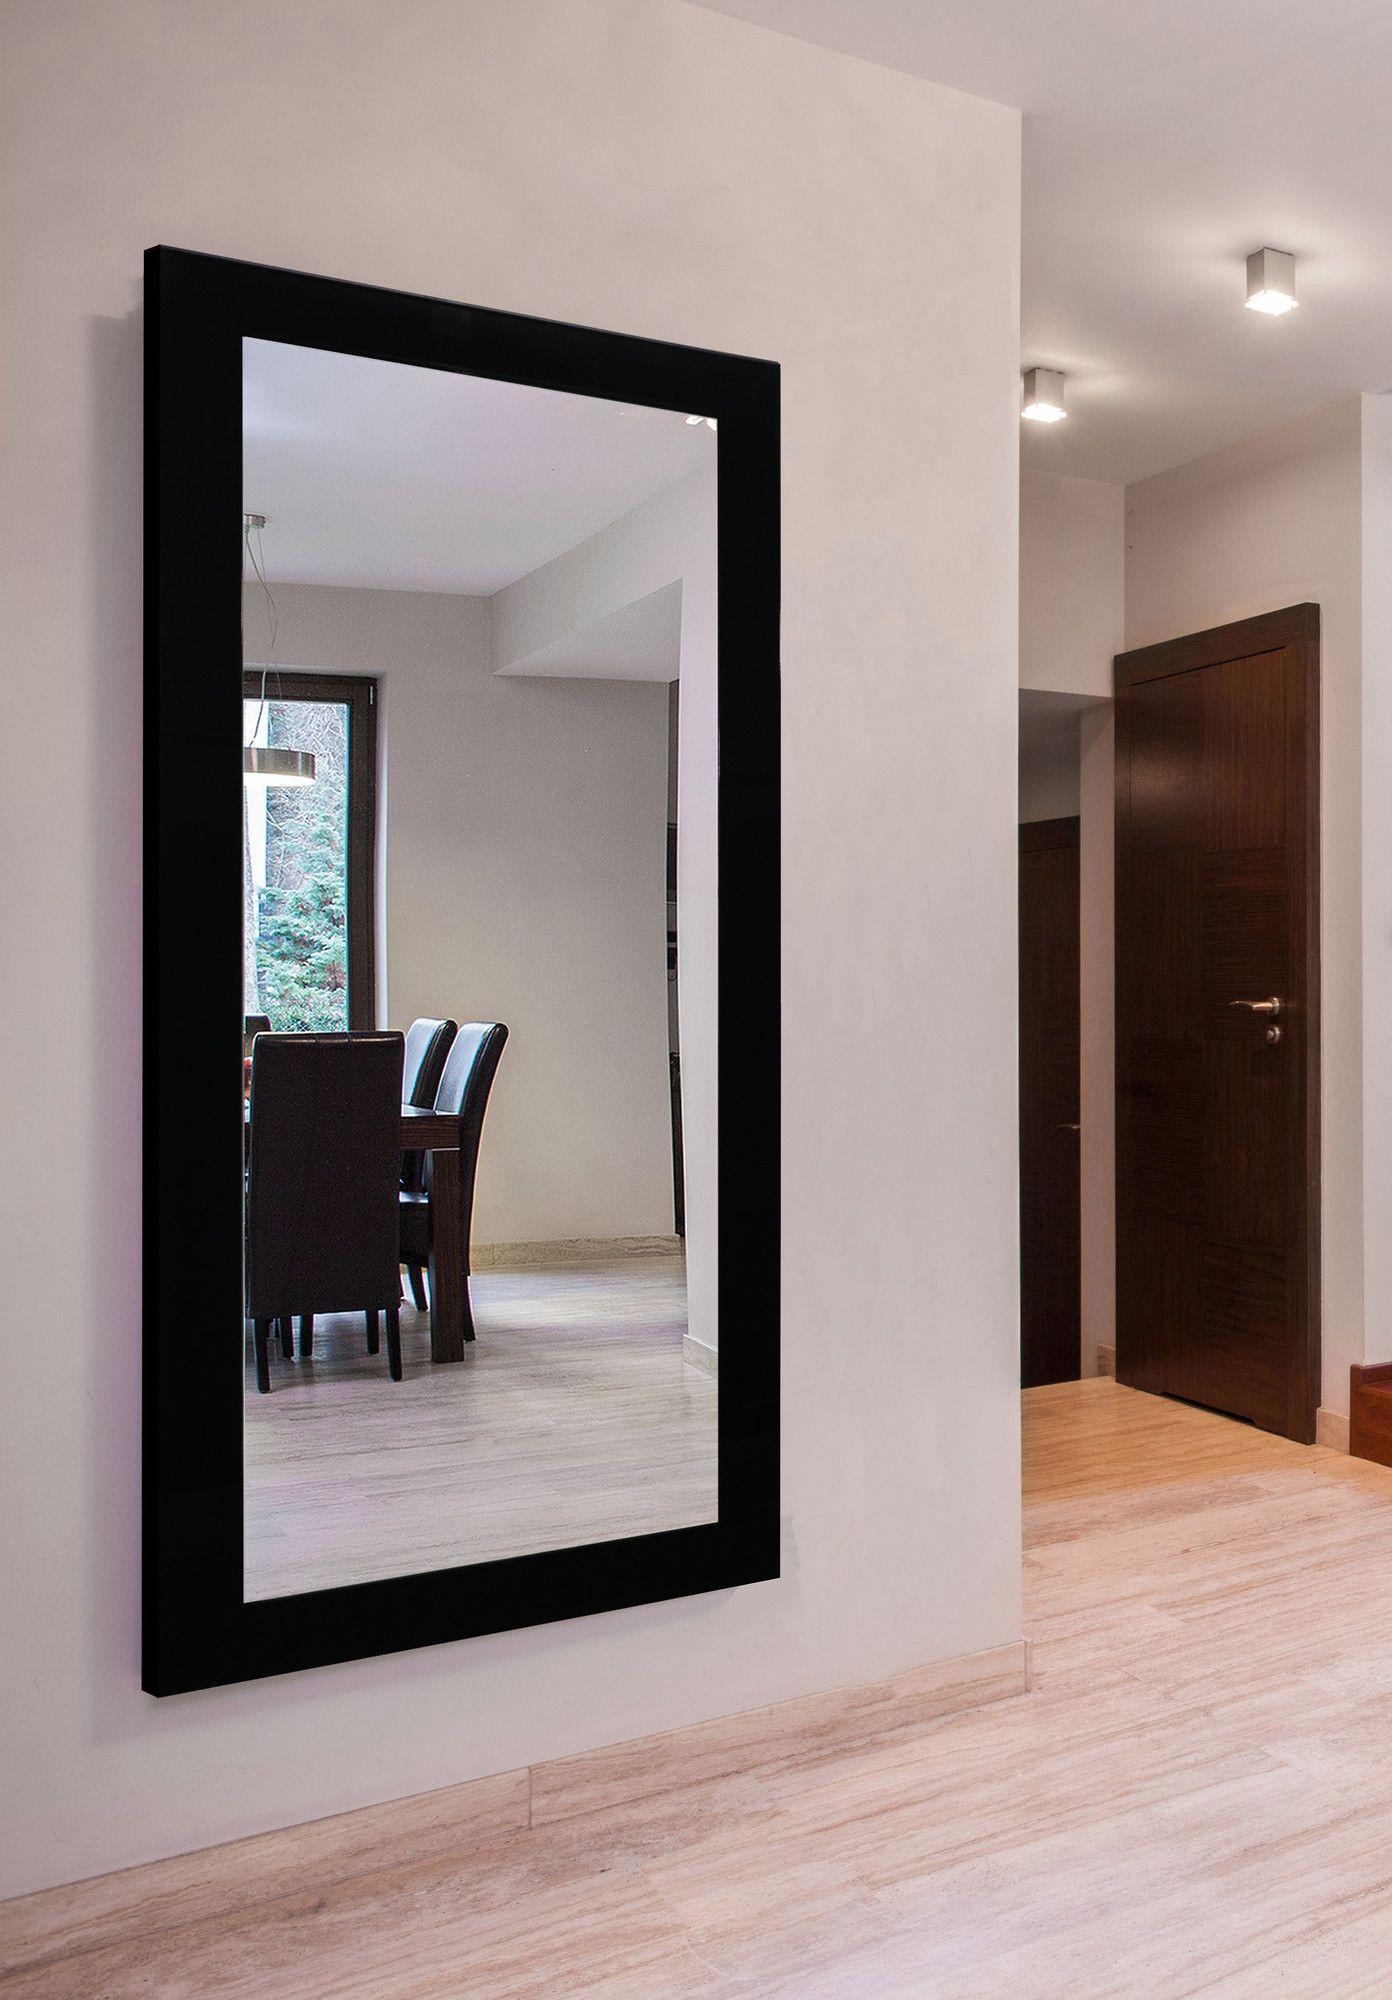 Landyn Jace Extra Delta Mirror Mirror wall, Classic wall